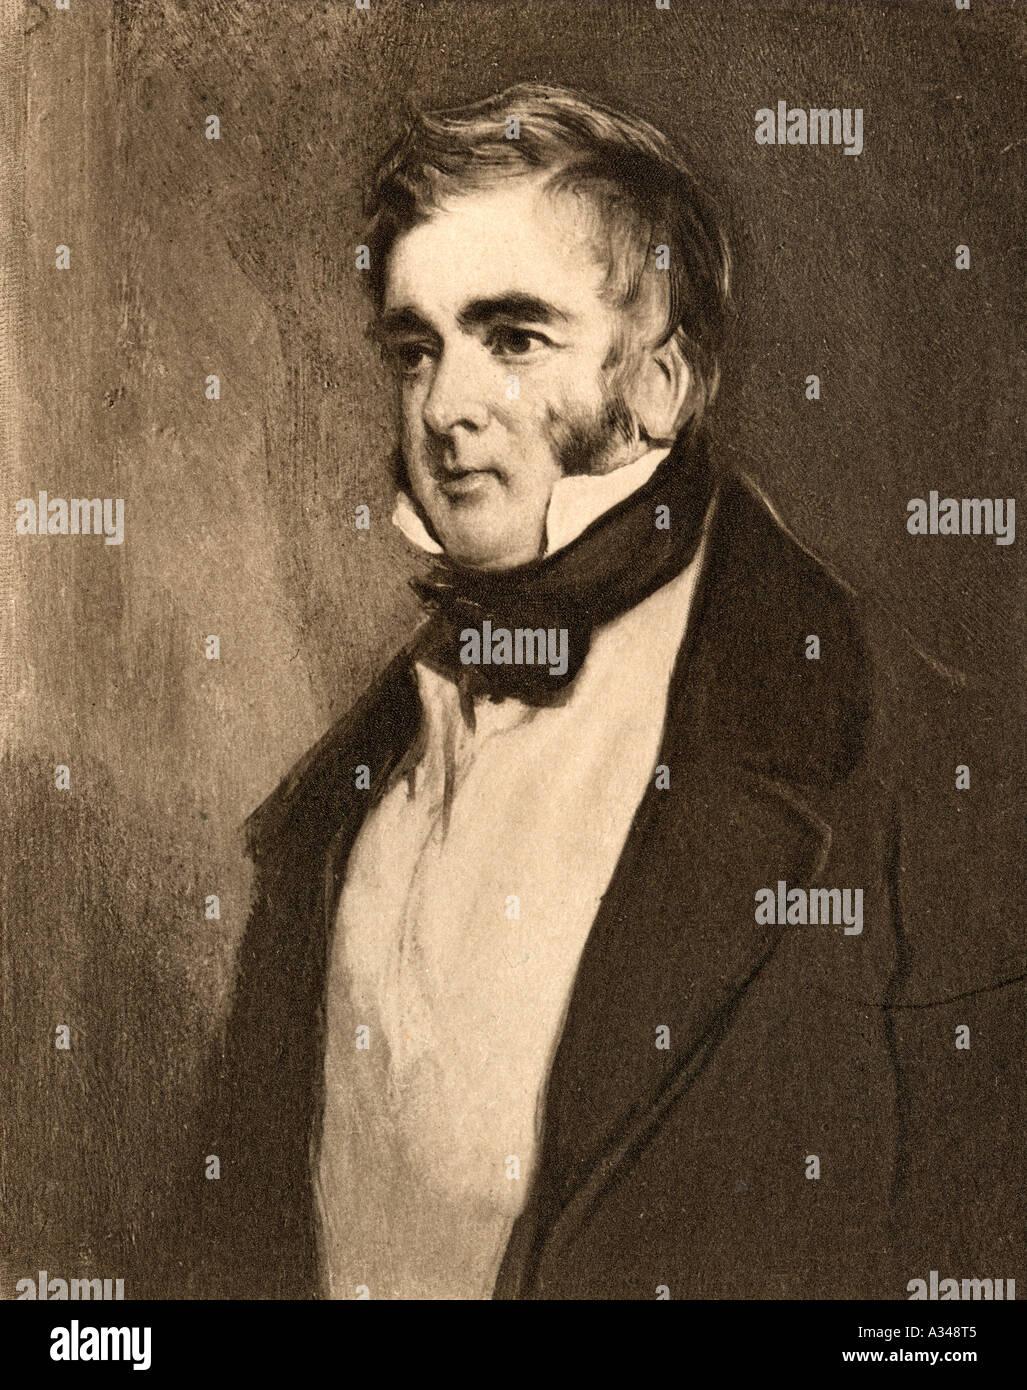 1834 1835 stock photos & 1834 1835 stock images - alamy